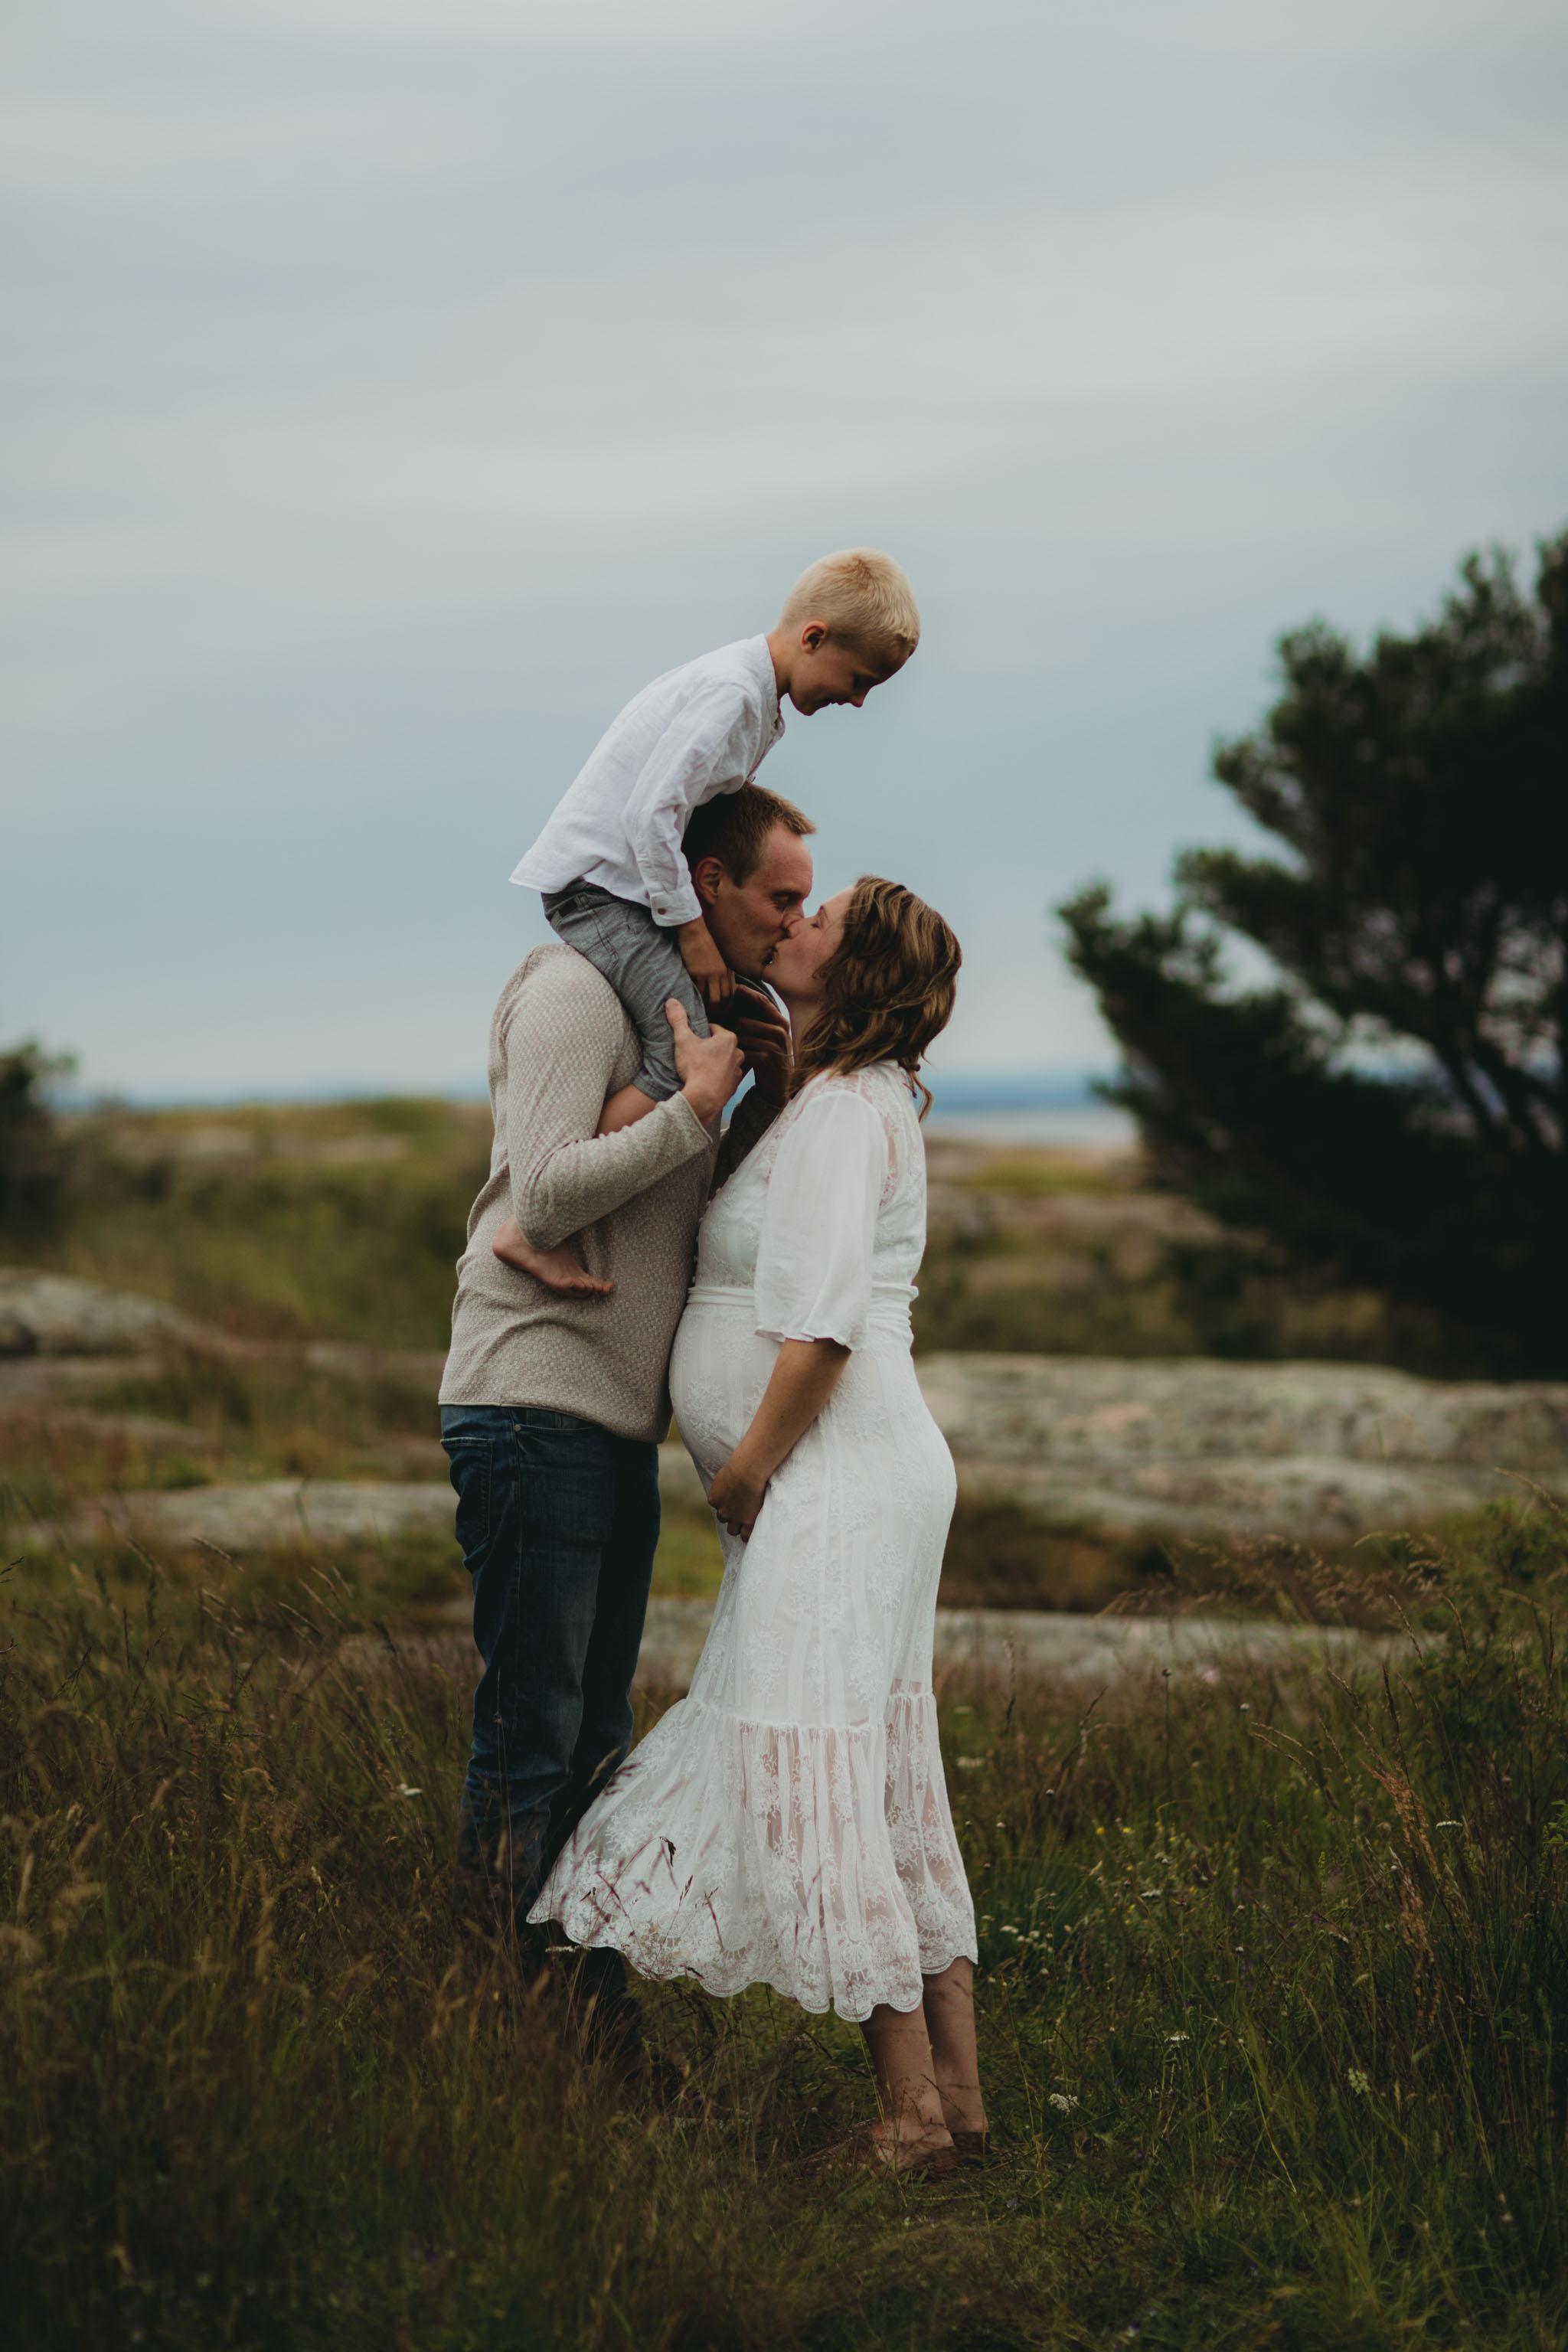 Gravidfoto - Familie i natur - Fotograf Ida Hvattum